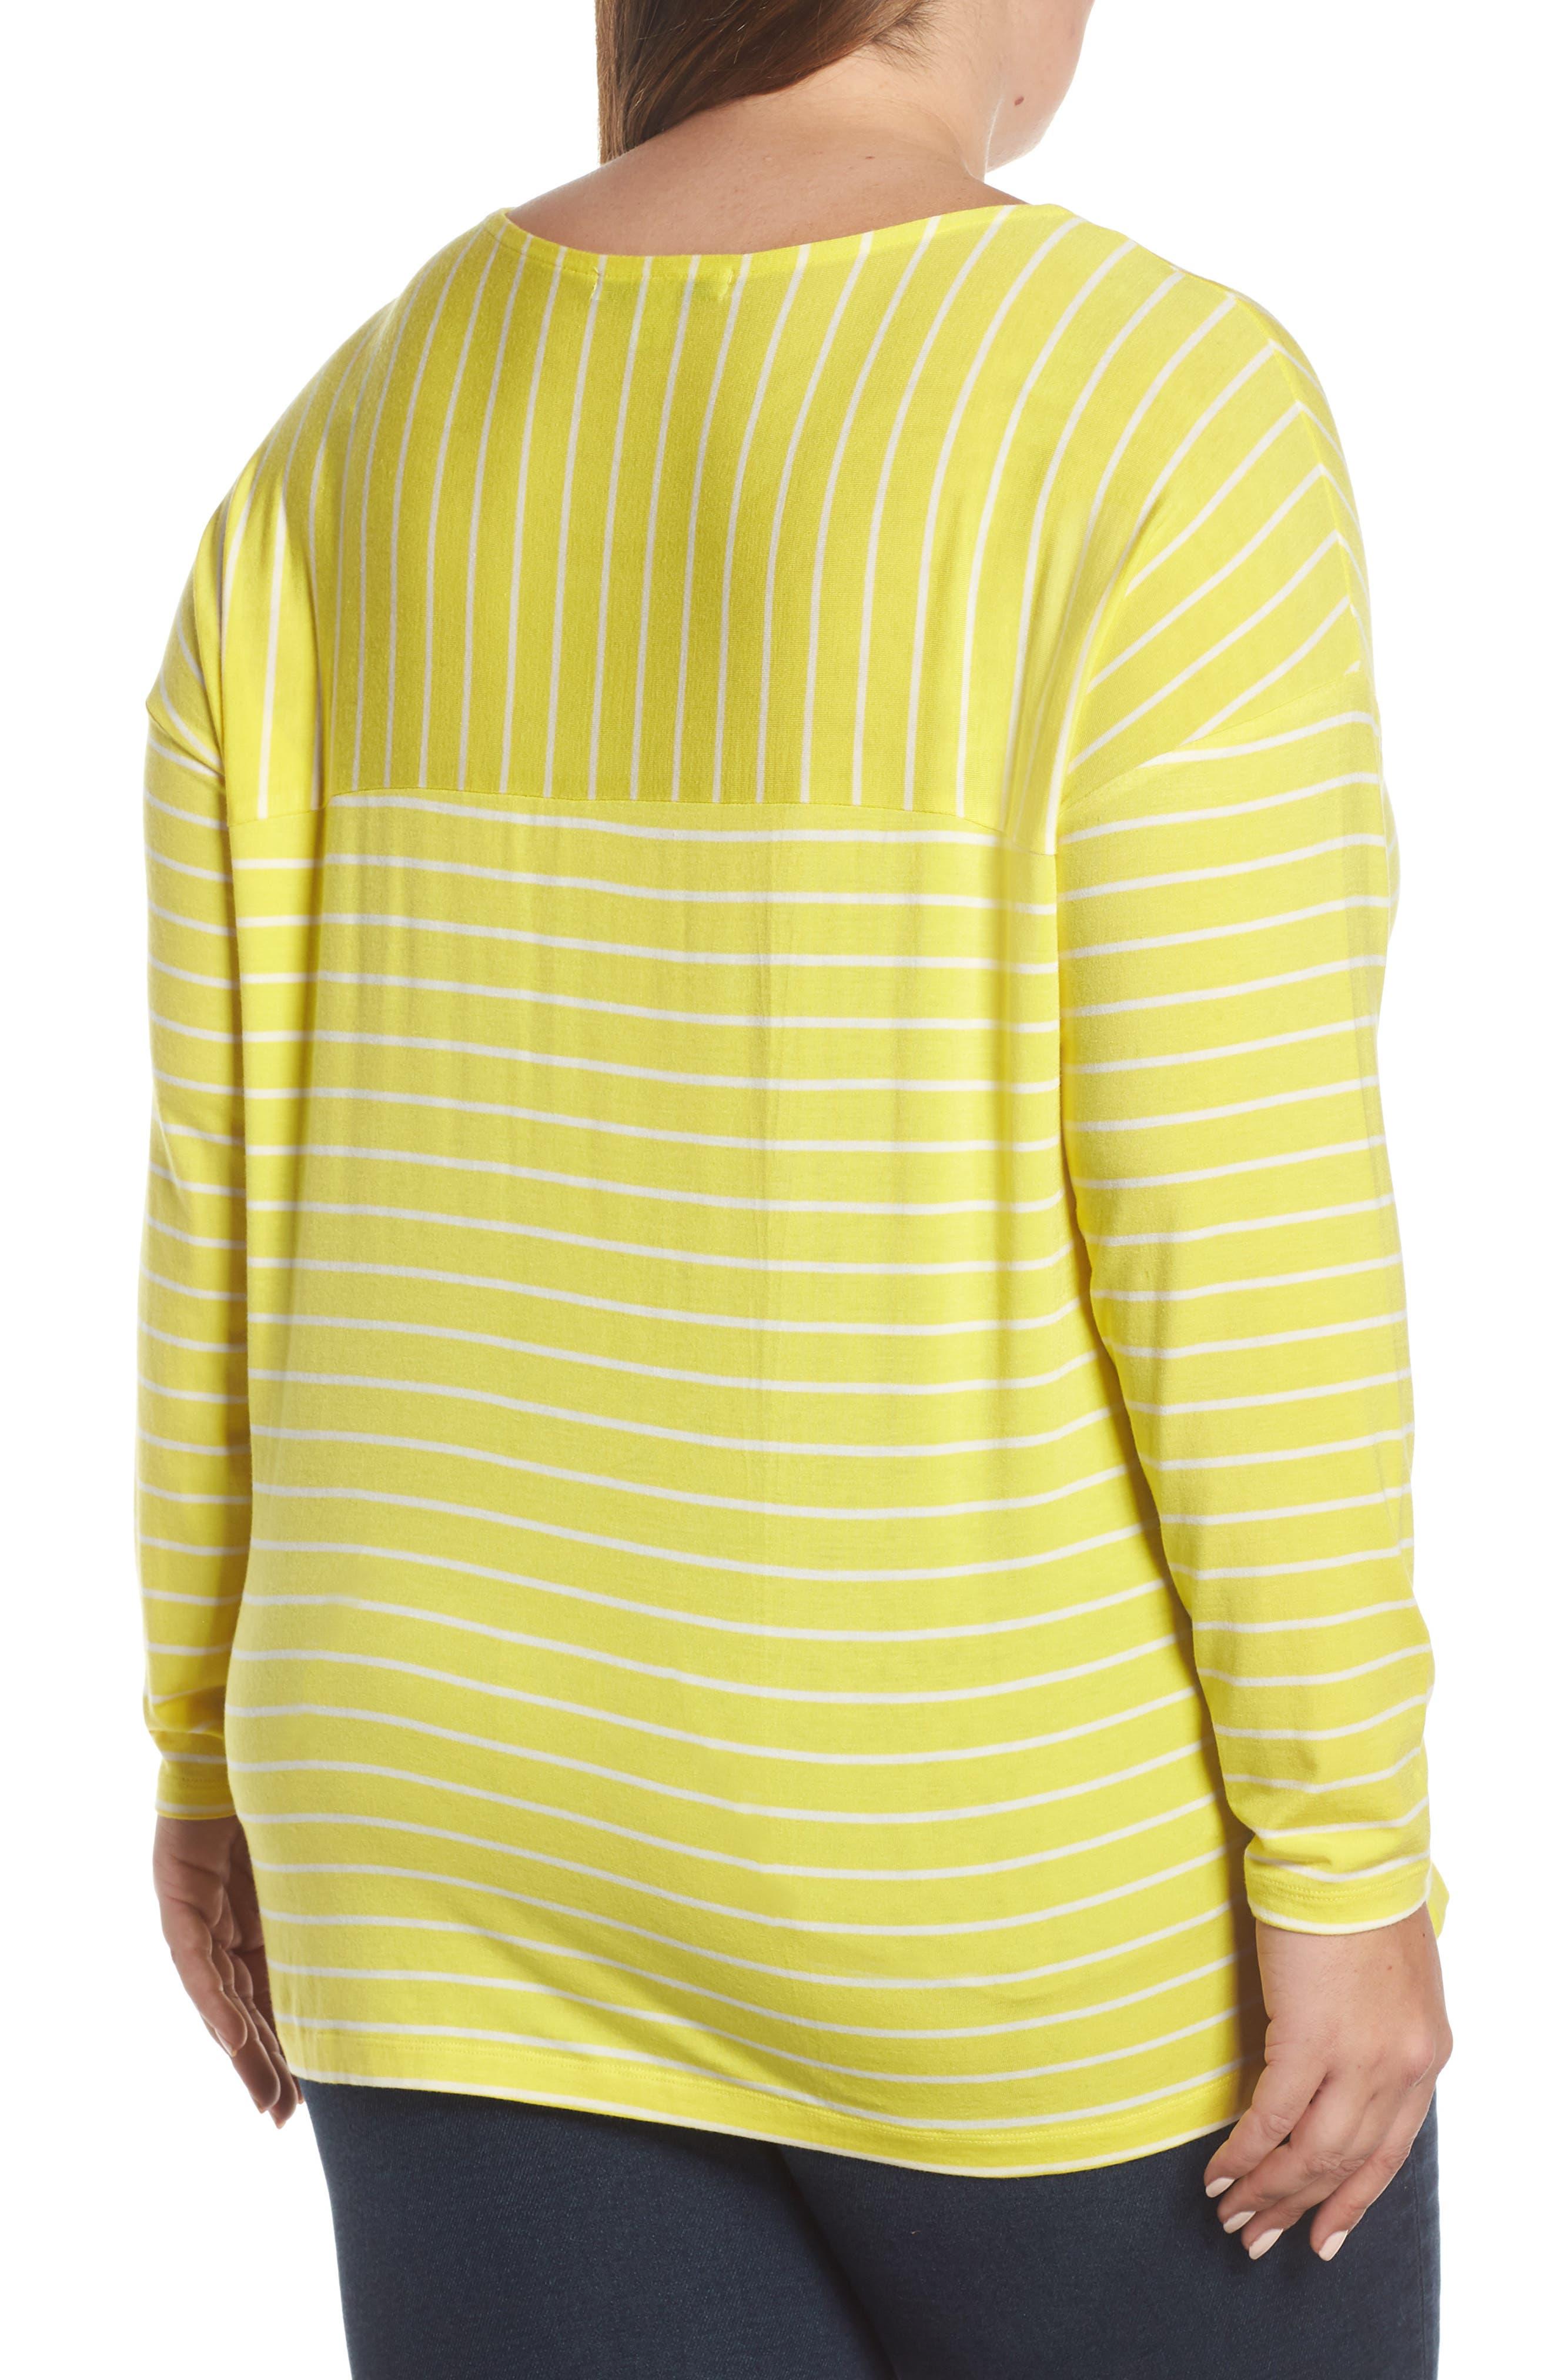 SEJOUR, Stripe Long Sleeve Tee, Alternate thumbnail 2, color, YELLOW ANYA STRIPE